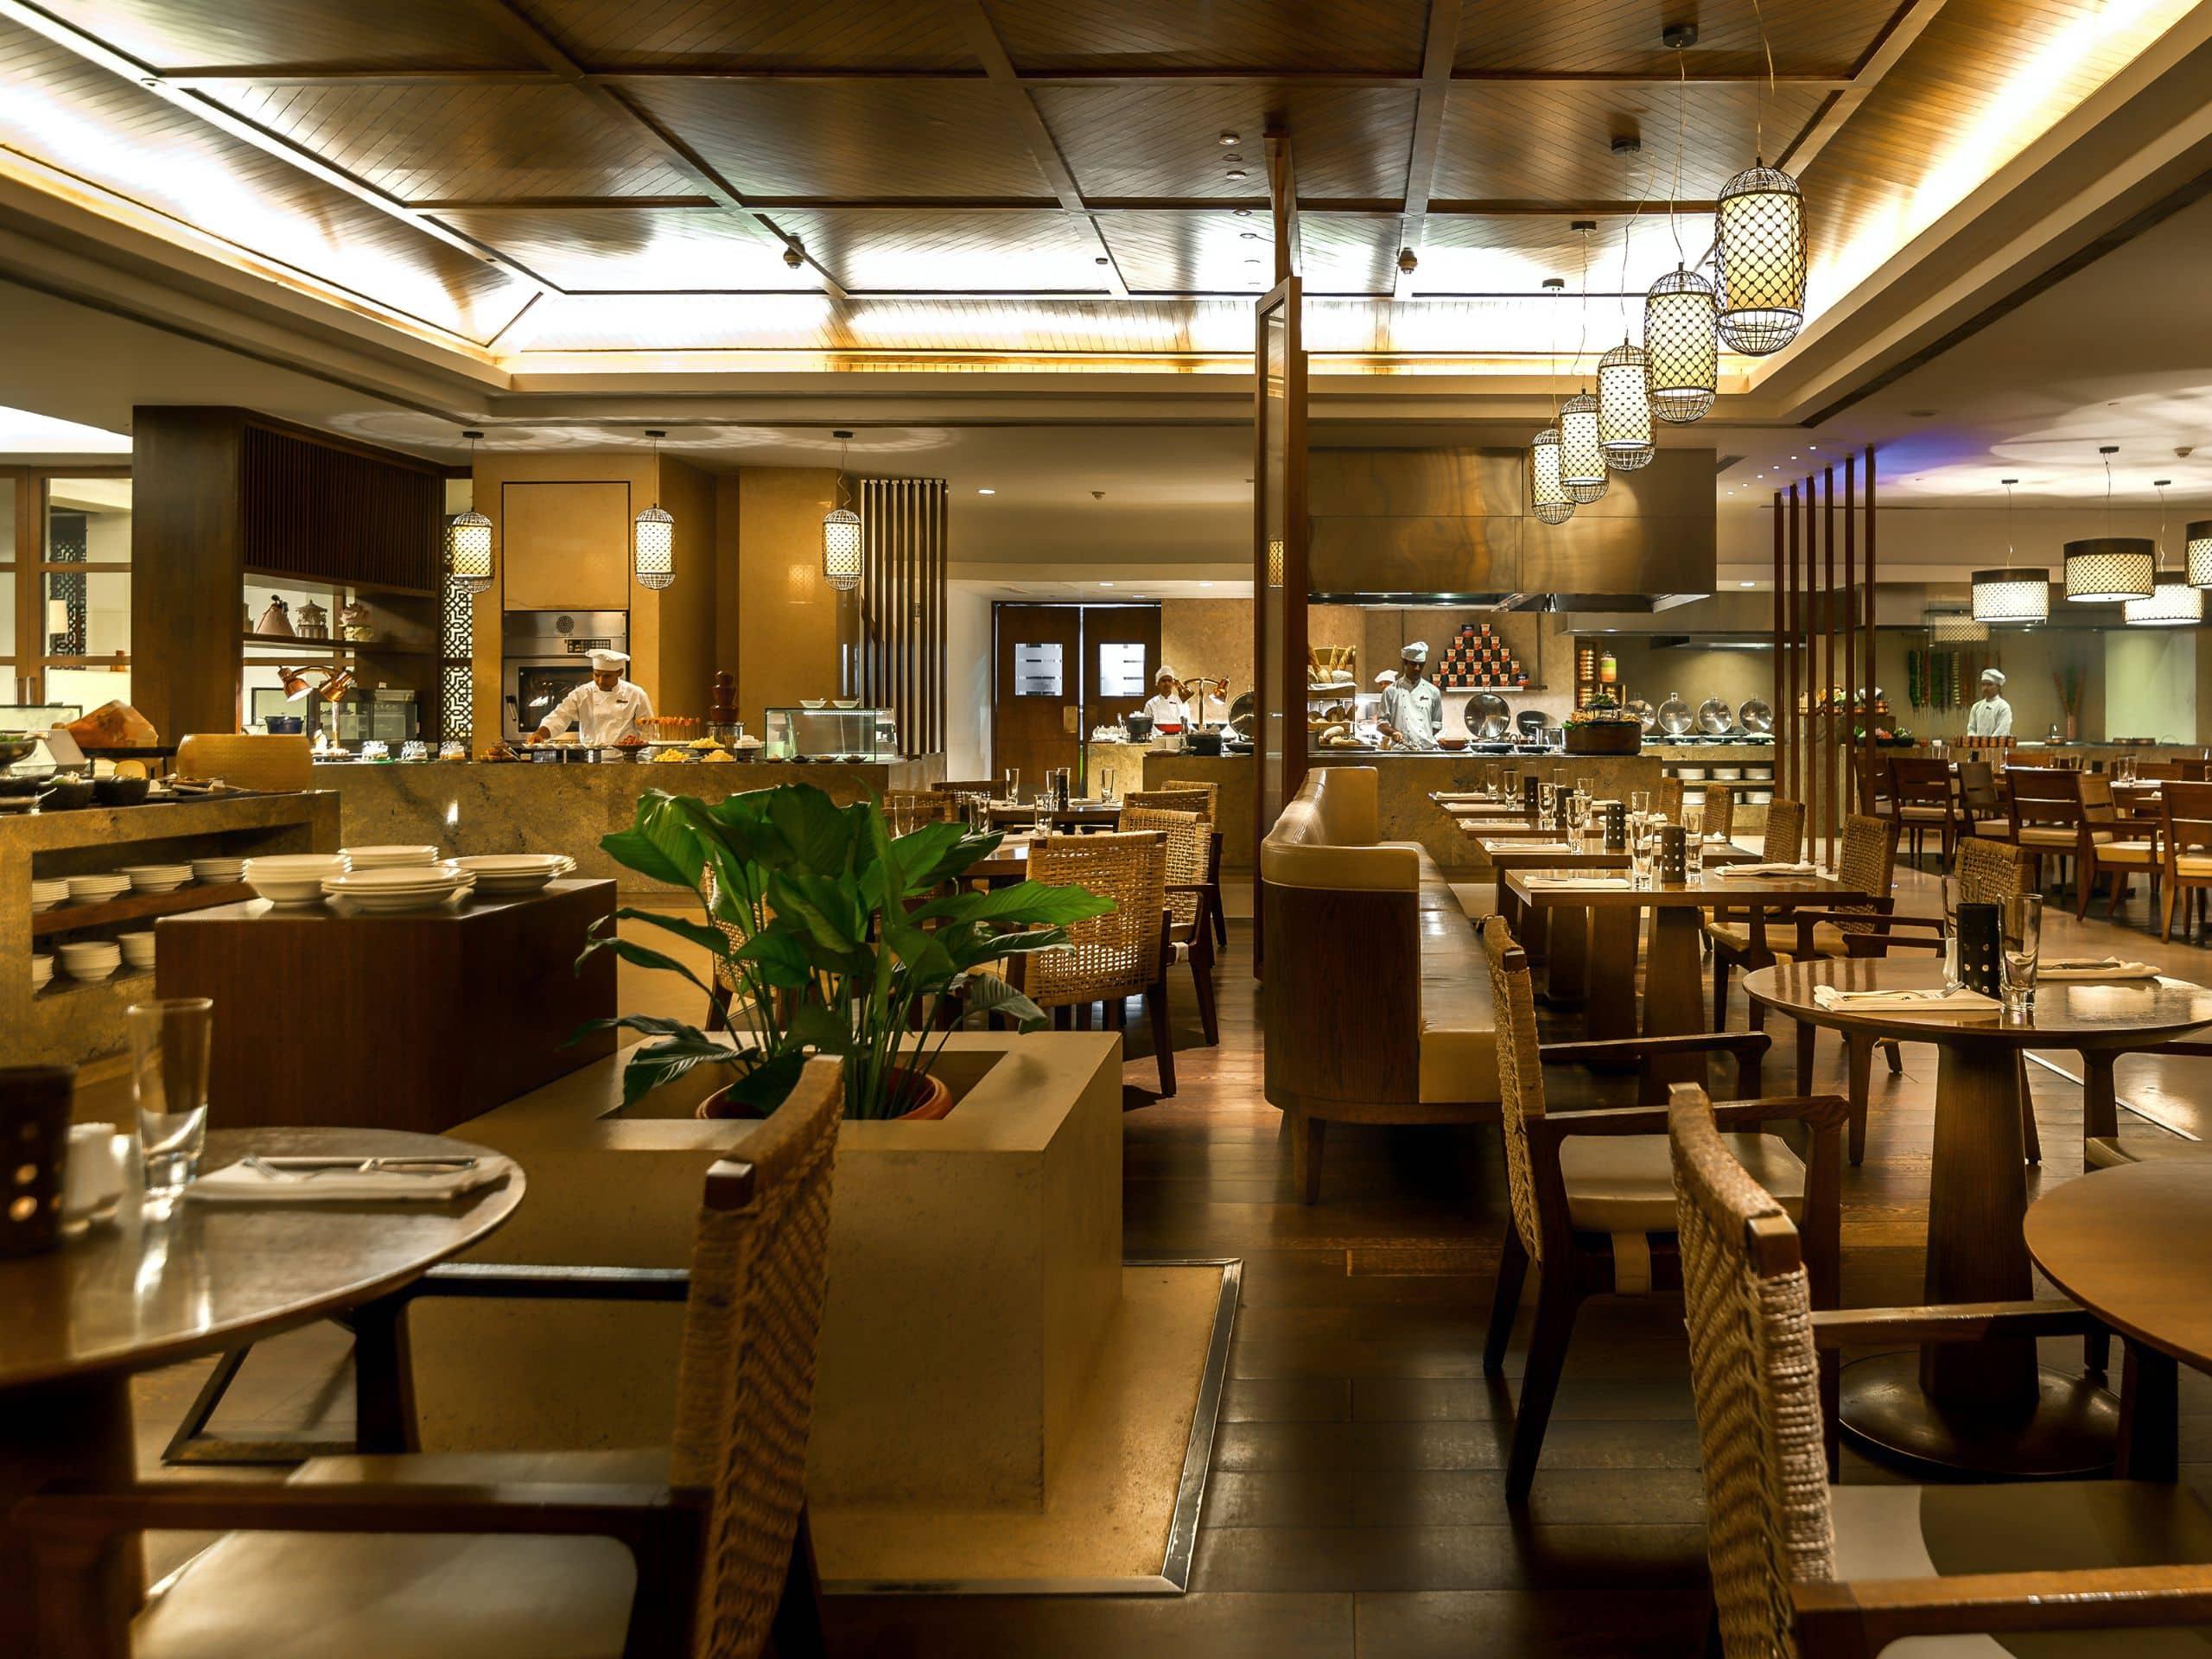 Best Restaurants In Goa Dine In Top Italian And Indian Restaurants Grand Hyatt Goa